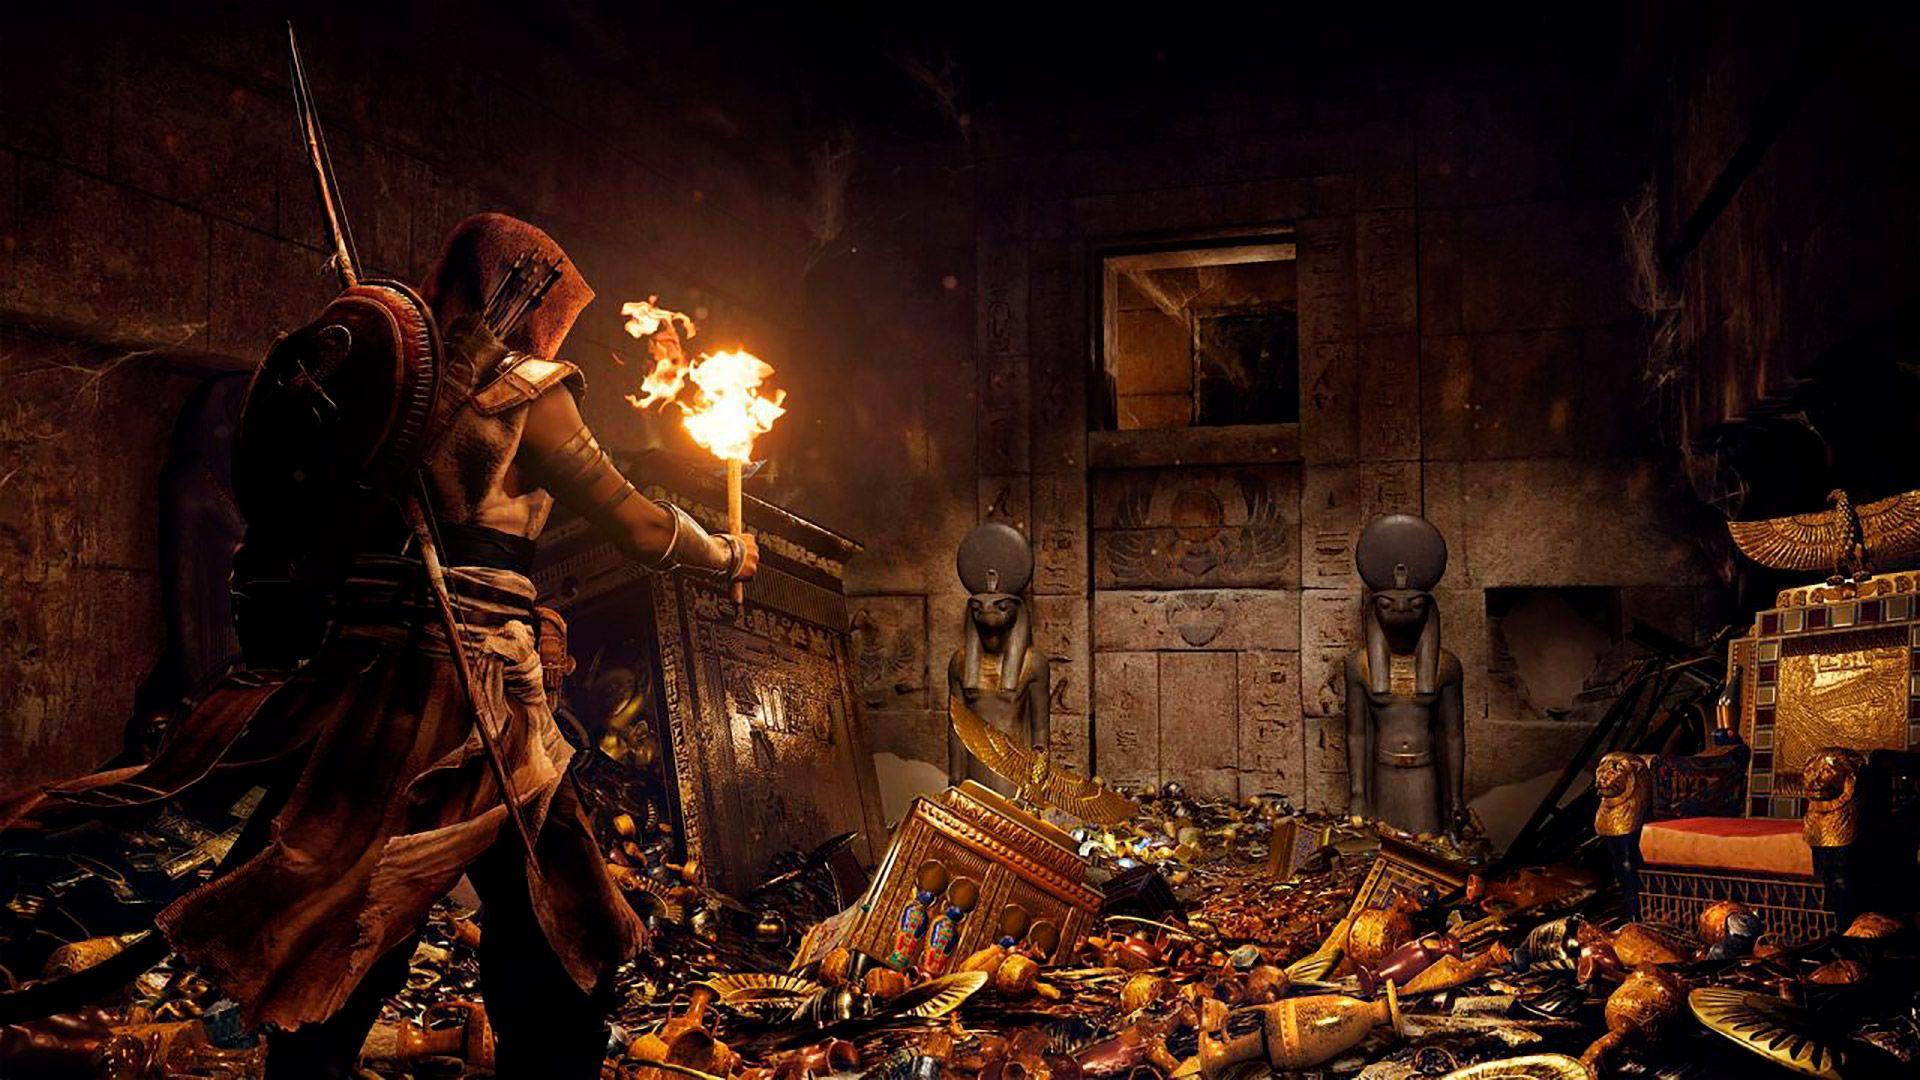 Assassin's Creed Истоки изображение 8